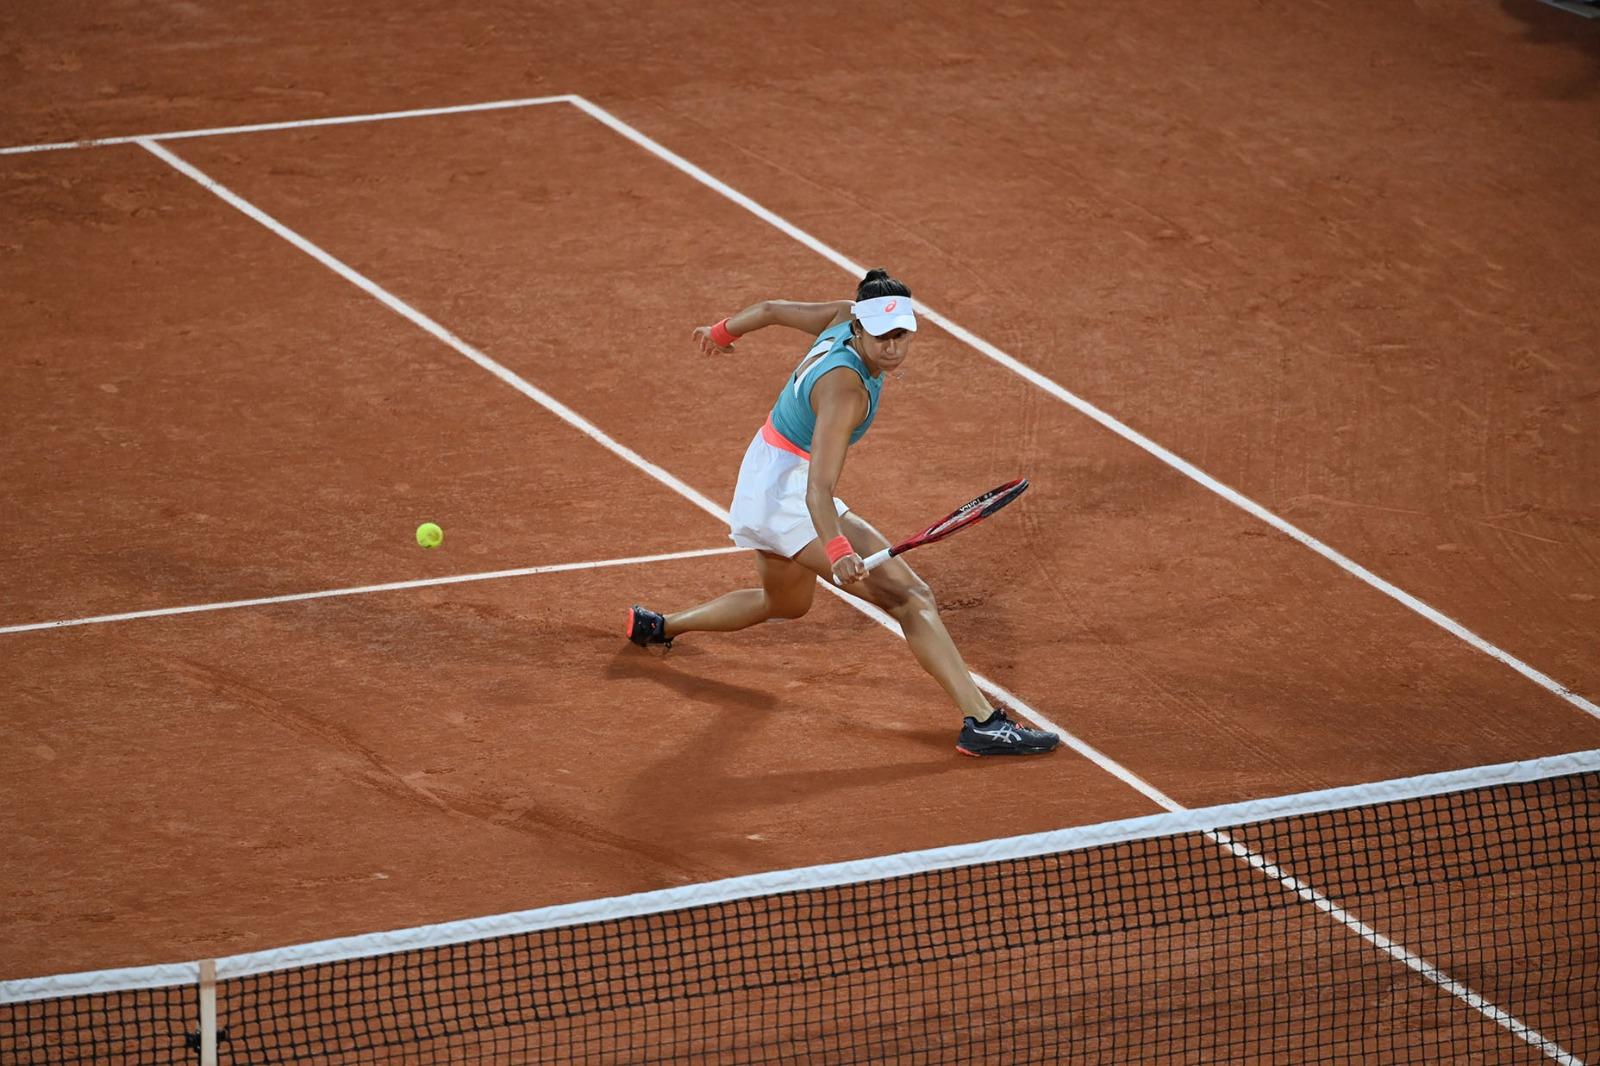 Roland Garros Resume Du Jour Du Tableau Feminin Sport Business Mag